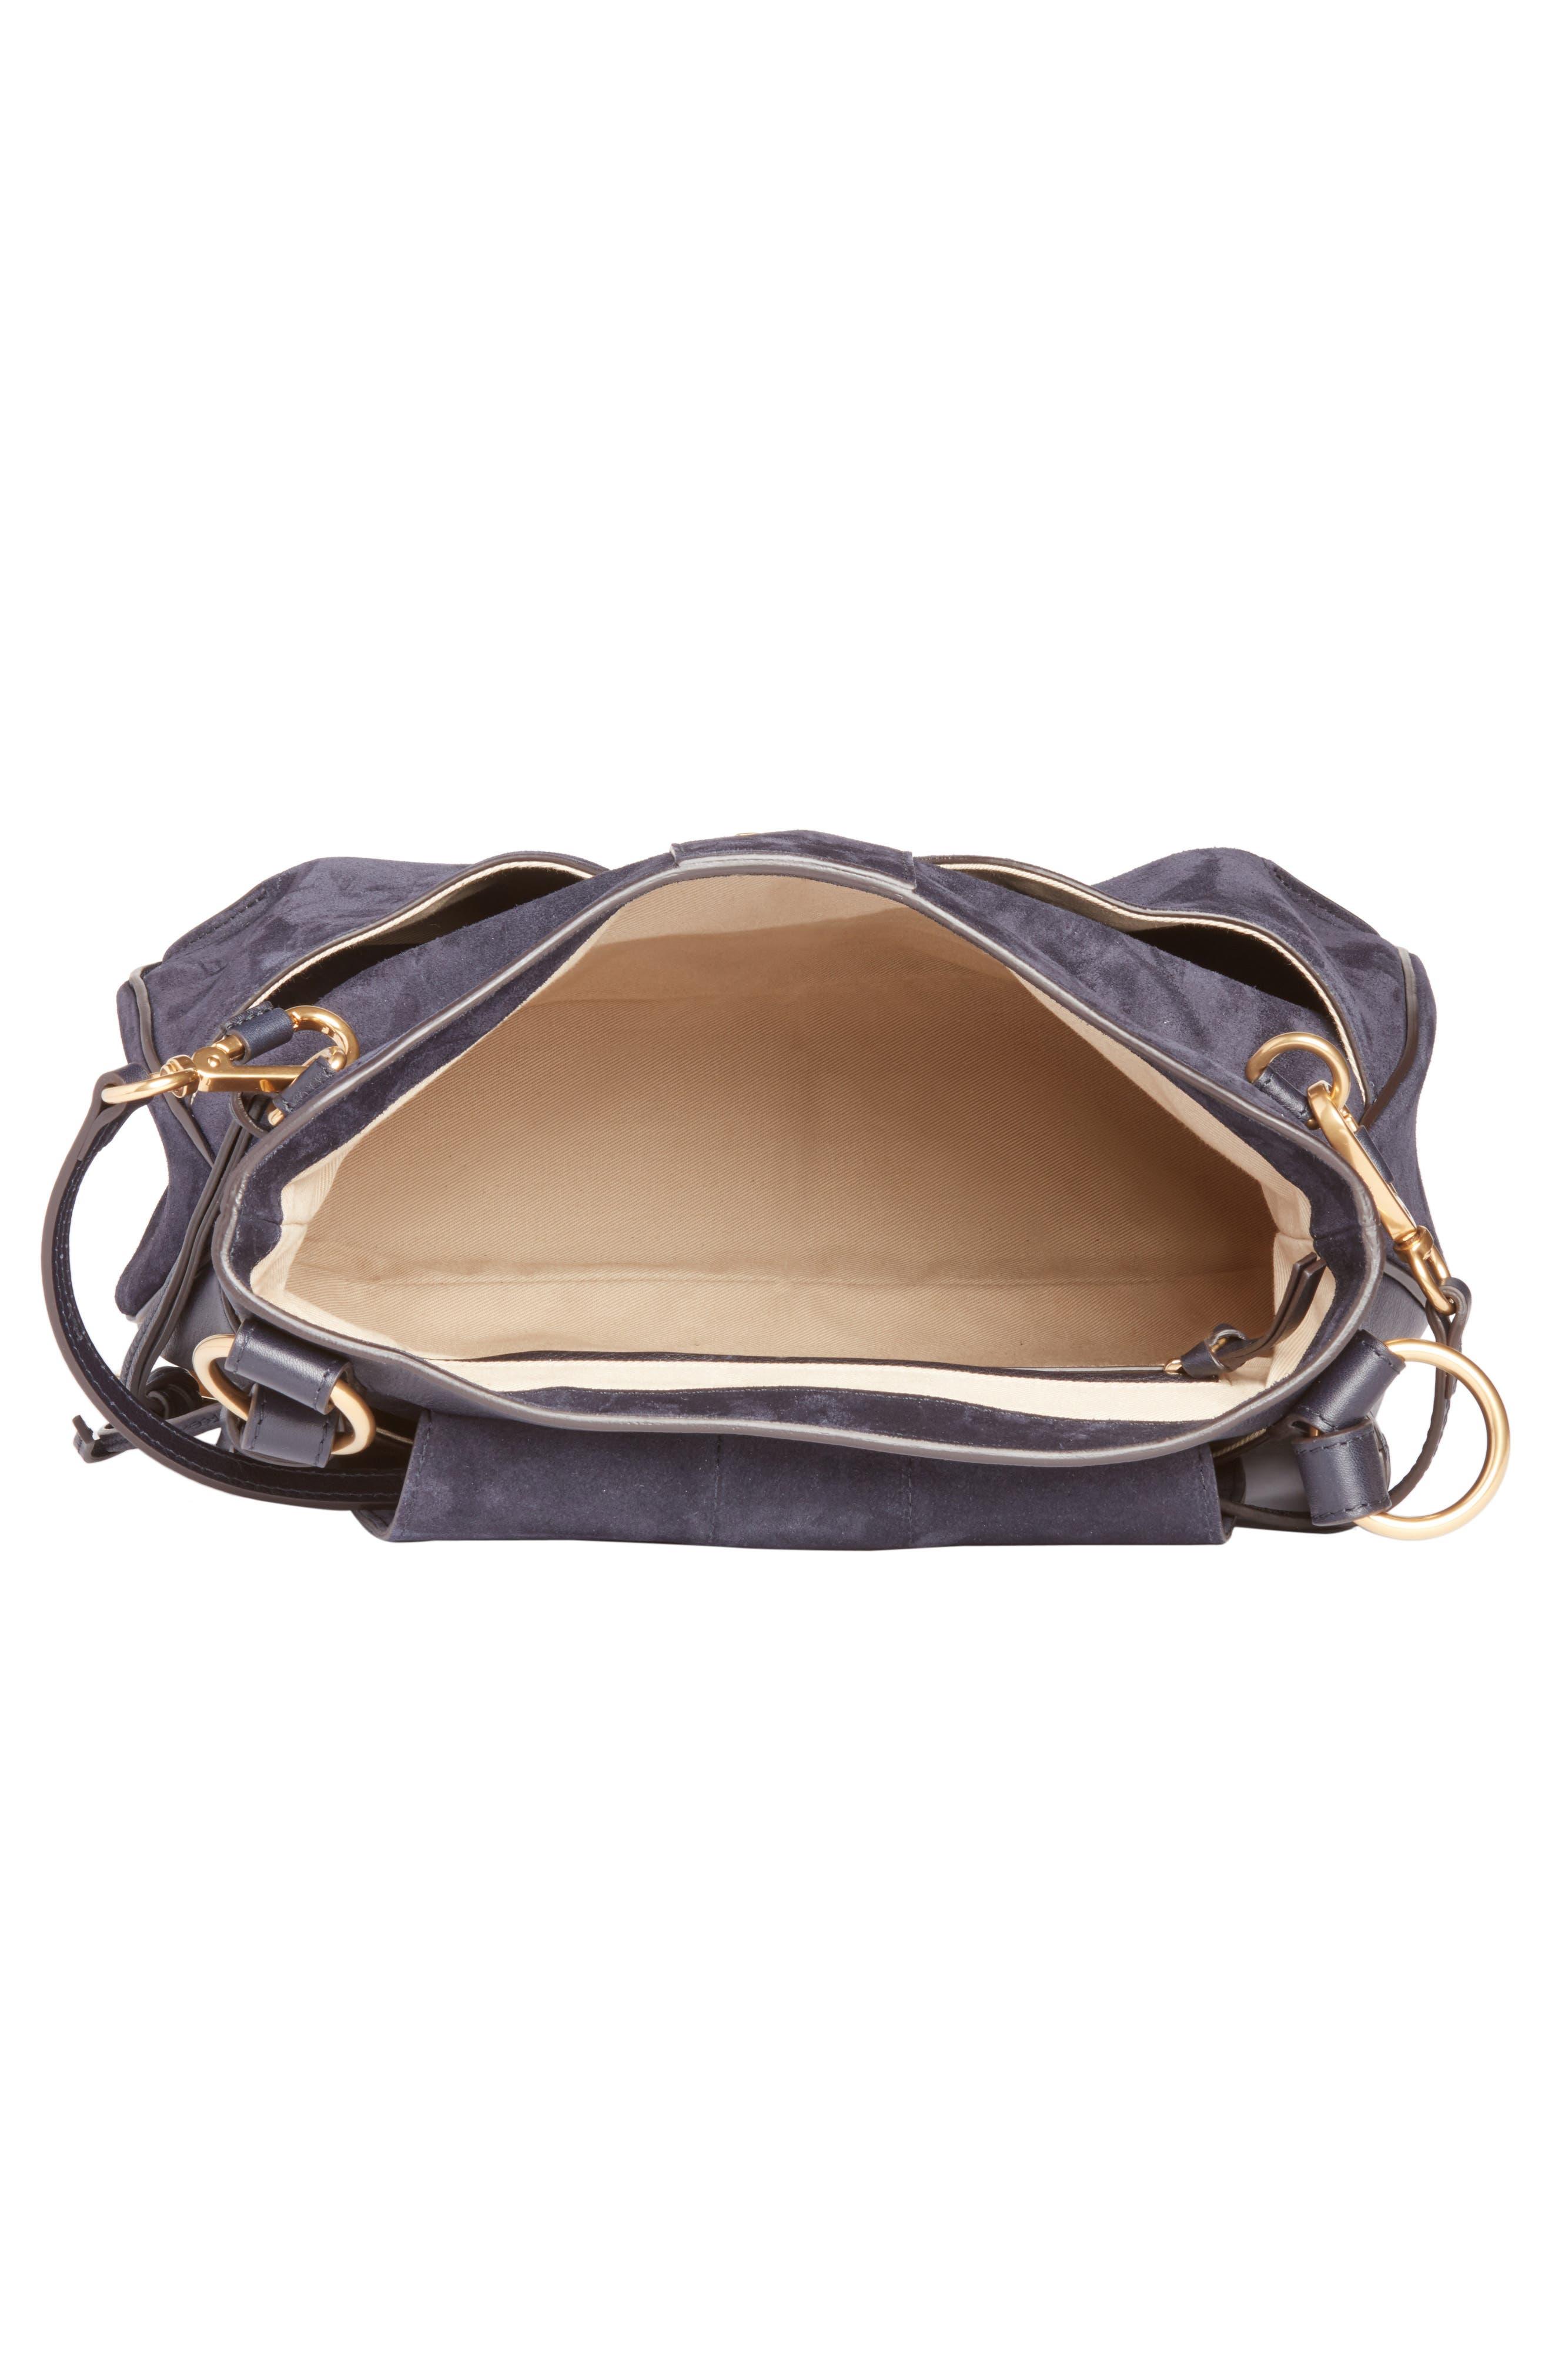 Medium Lexa Suede Shoulder Bag,                             Alternate thumbnail 3, color,                             412